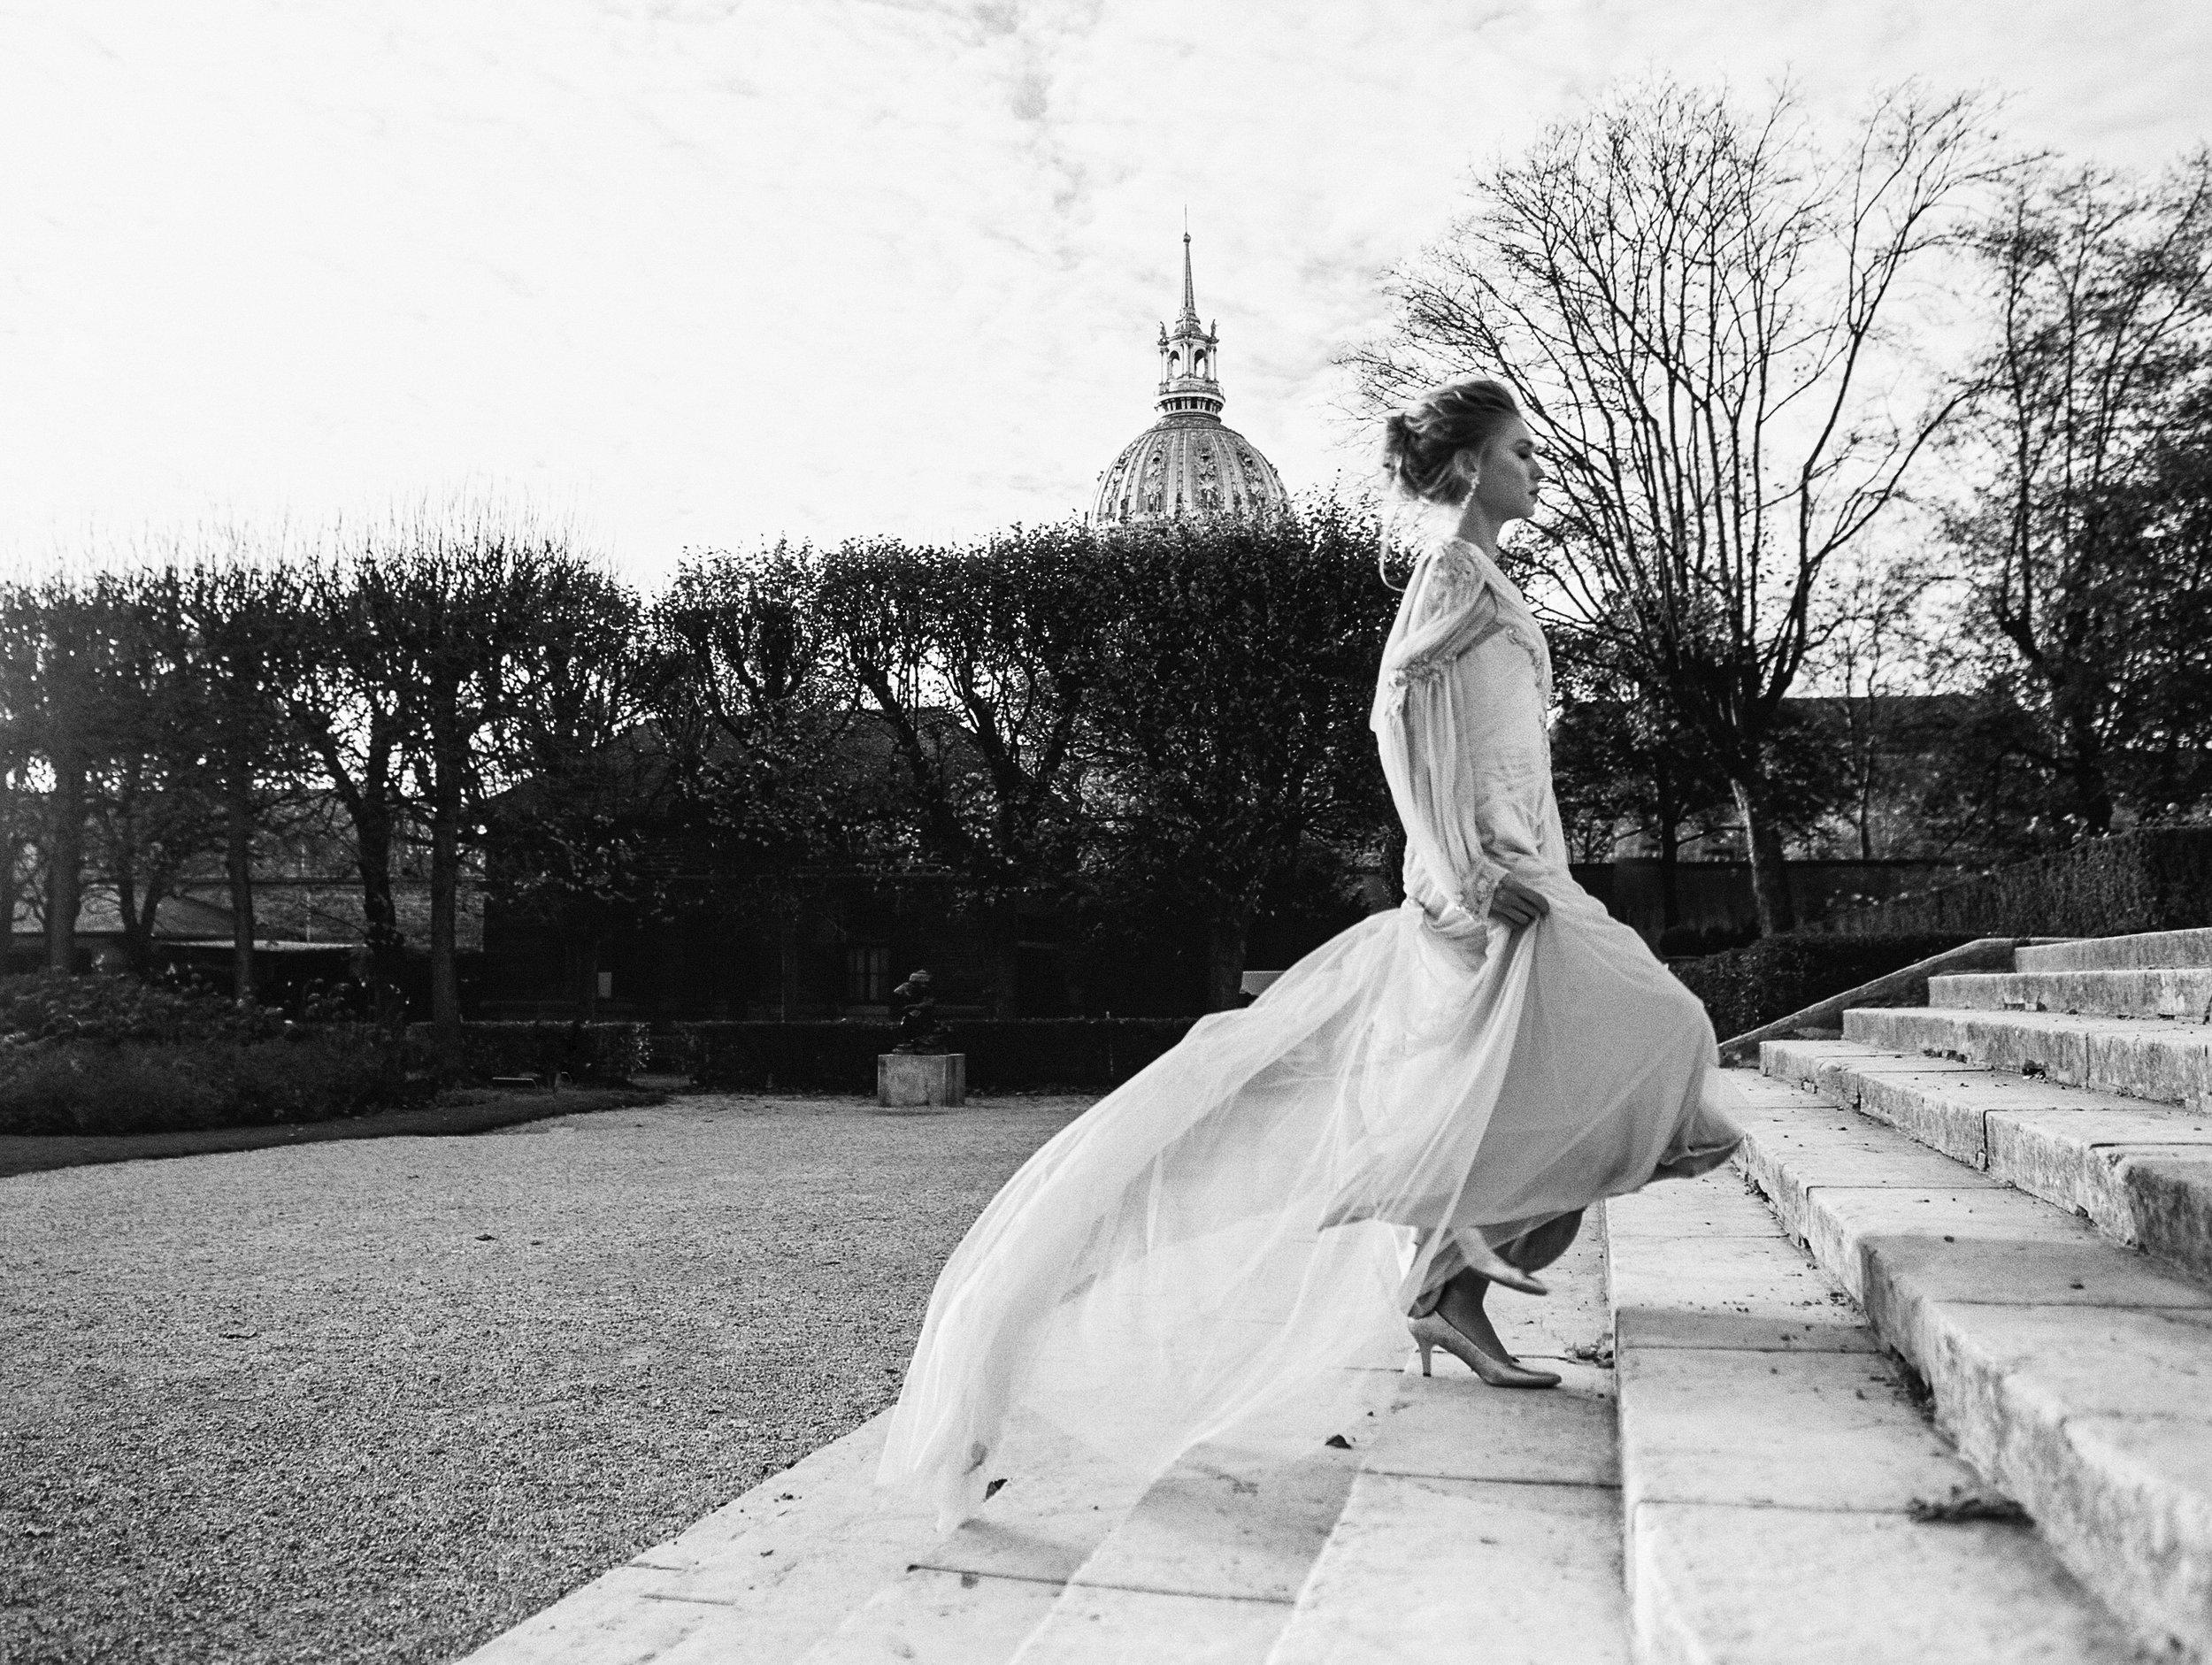 katie stoops photography-paris wedding-marchesa-cynthia martyn events24.jpg